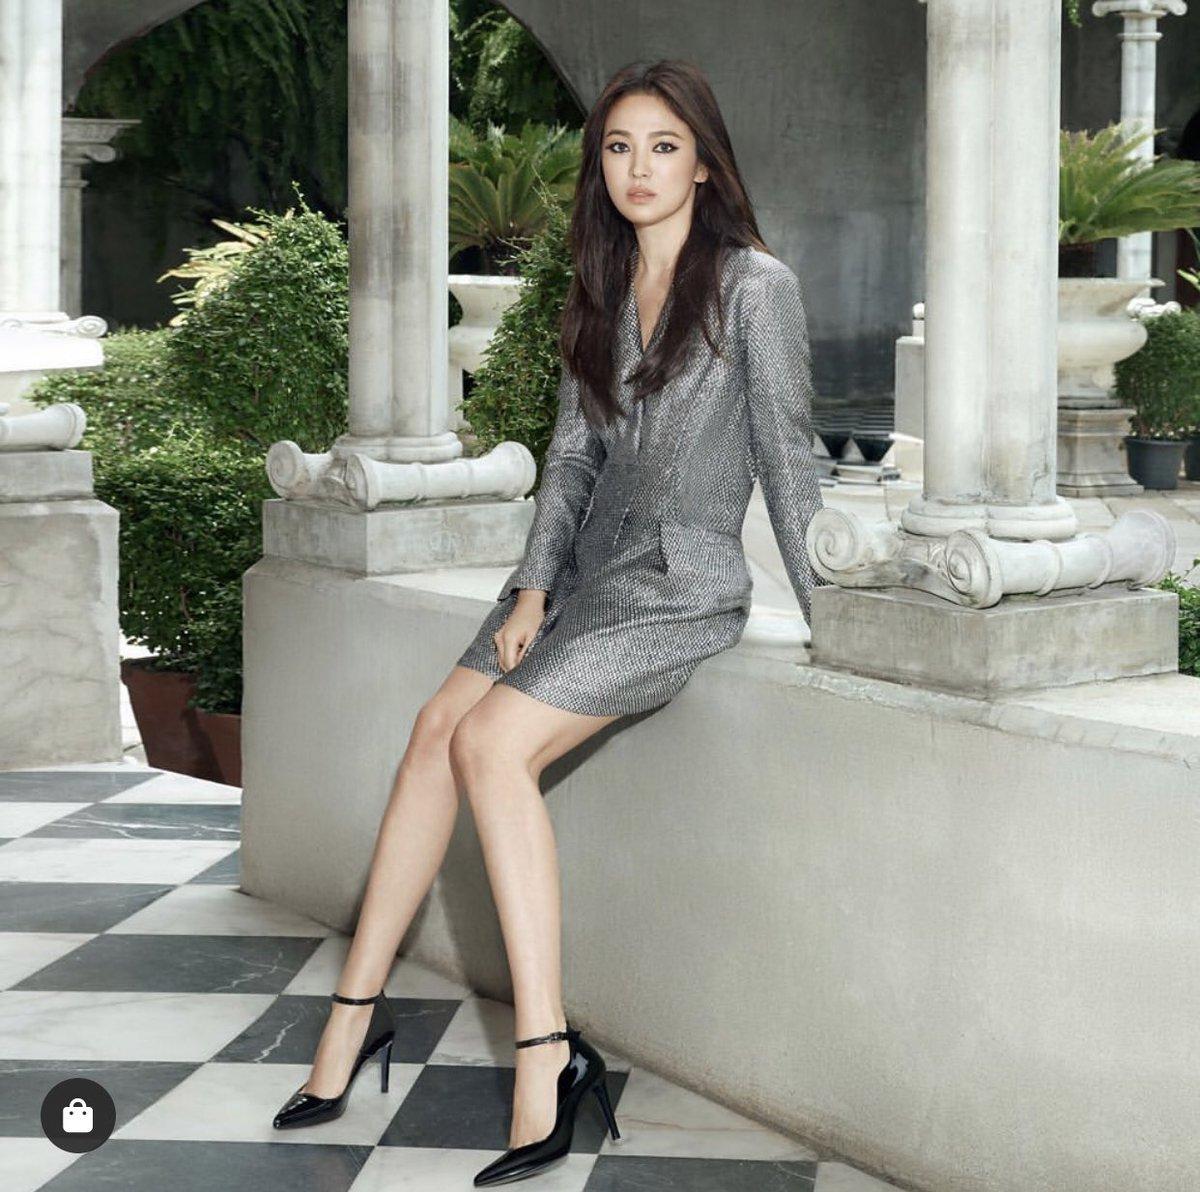 song hye kyo latest news - 1000×1000